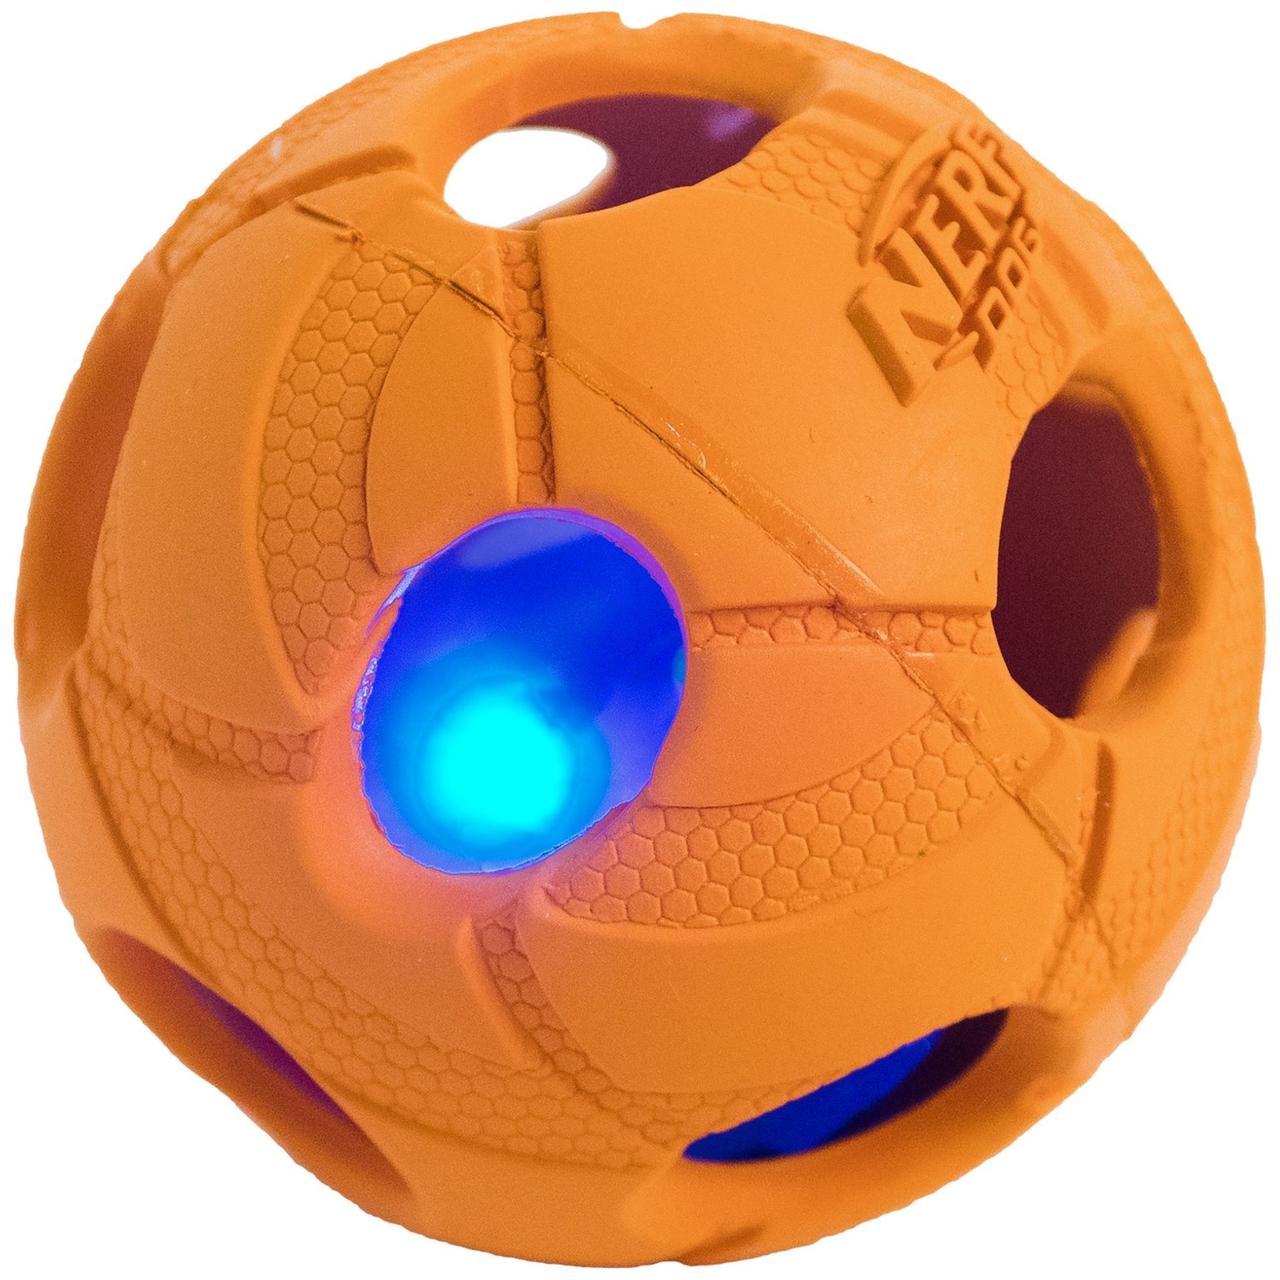 Игрушка для собак Hagen Nerf Dog LED Bash Ball, S, фото 1